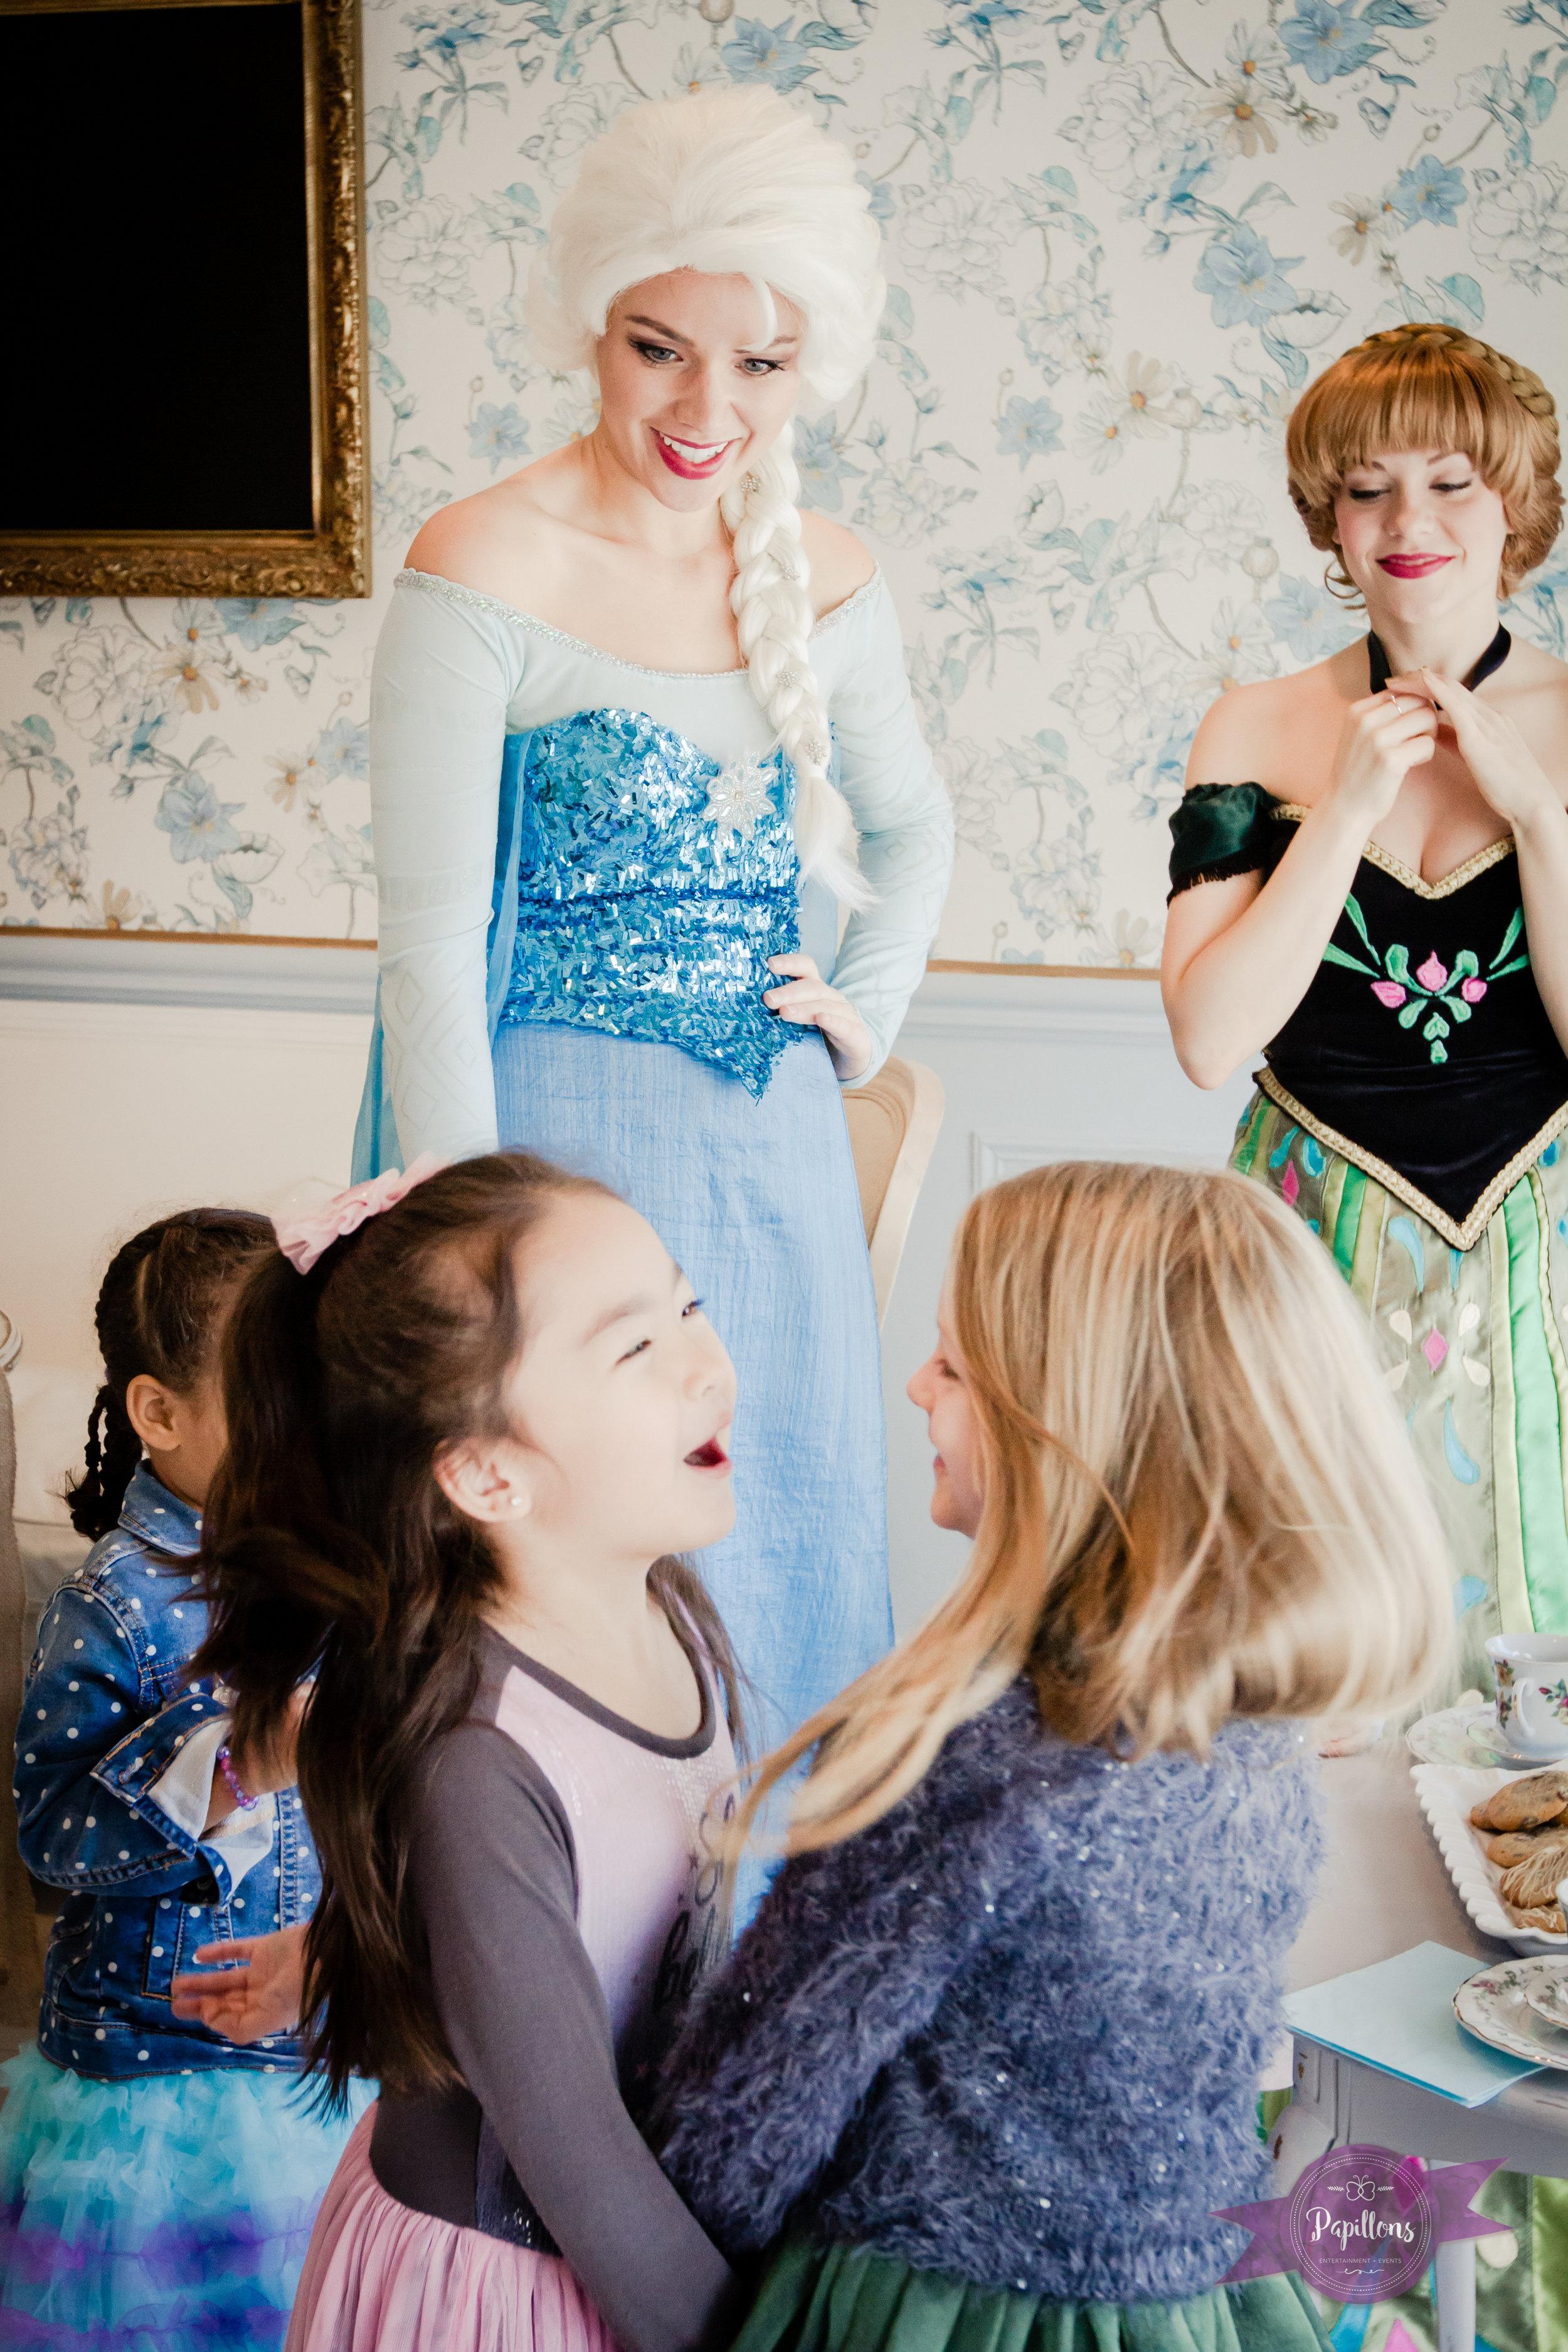 french confection co best friends queen elsa princess anna kids tea party burbank los angeles (1 of 1).jpg